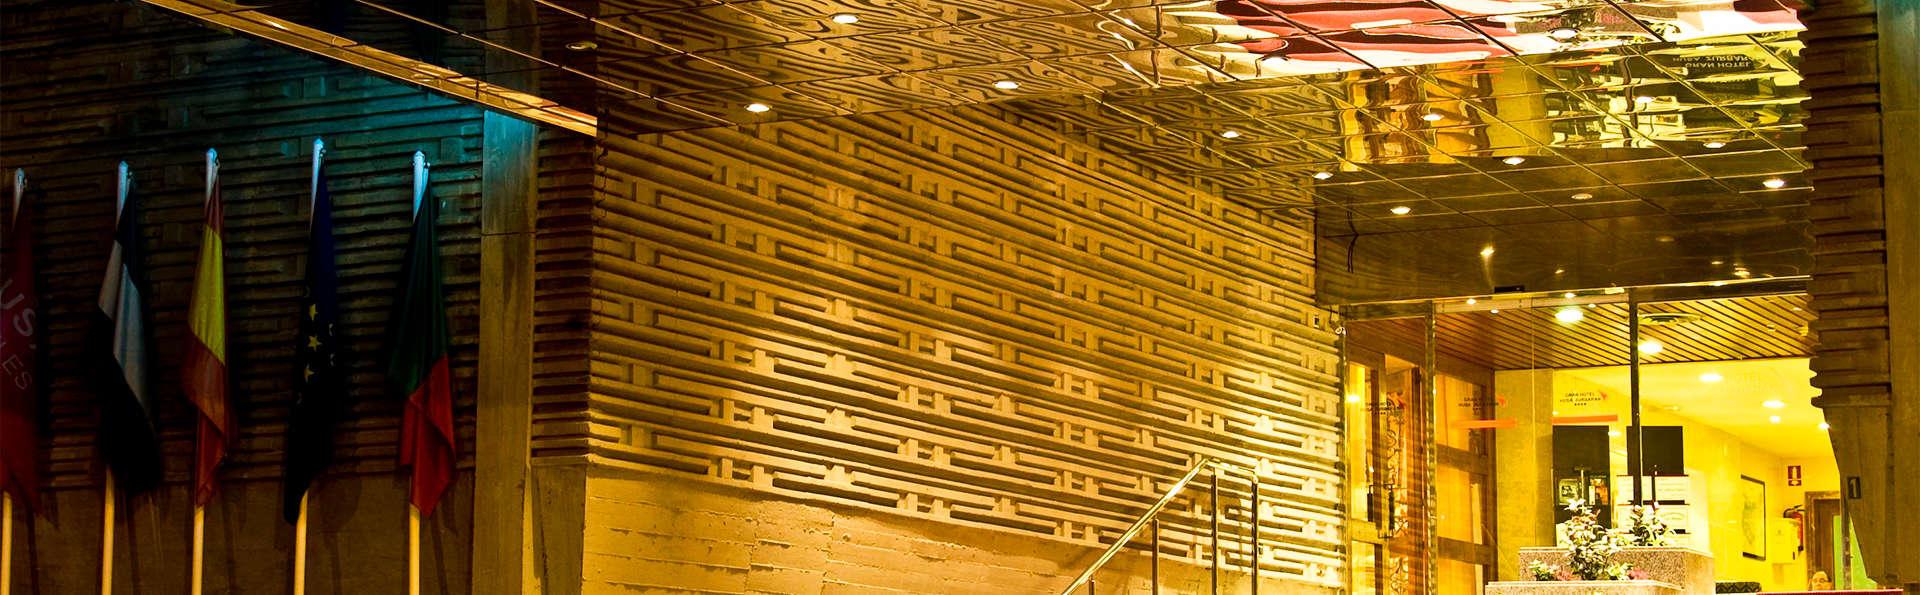 Sercotel Gran Hotel Zurbarán Badajoz - EDIT_Exterior.jpg